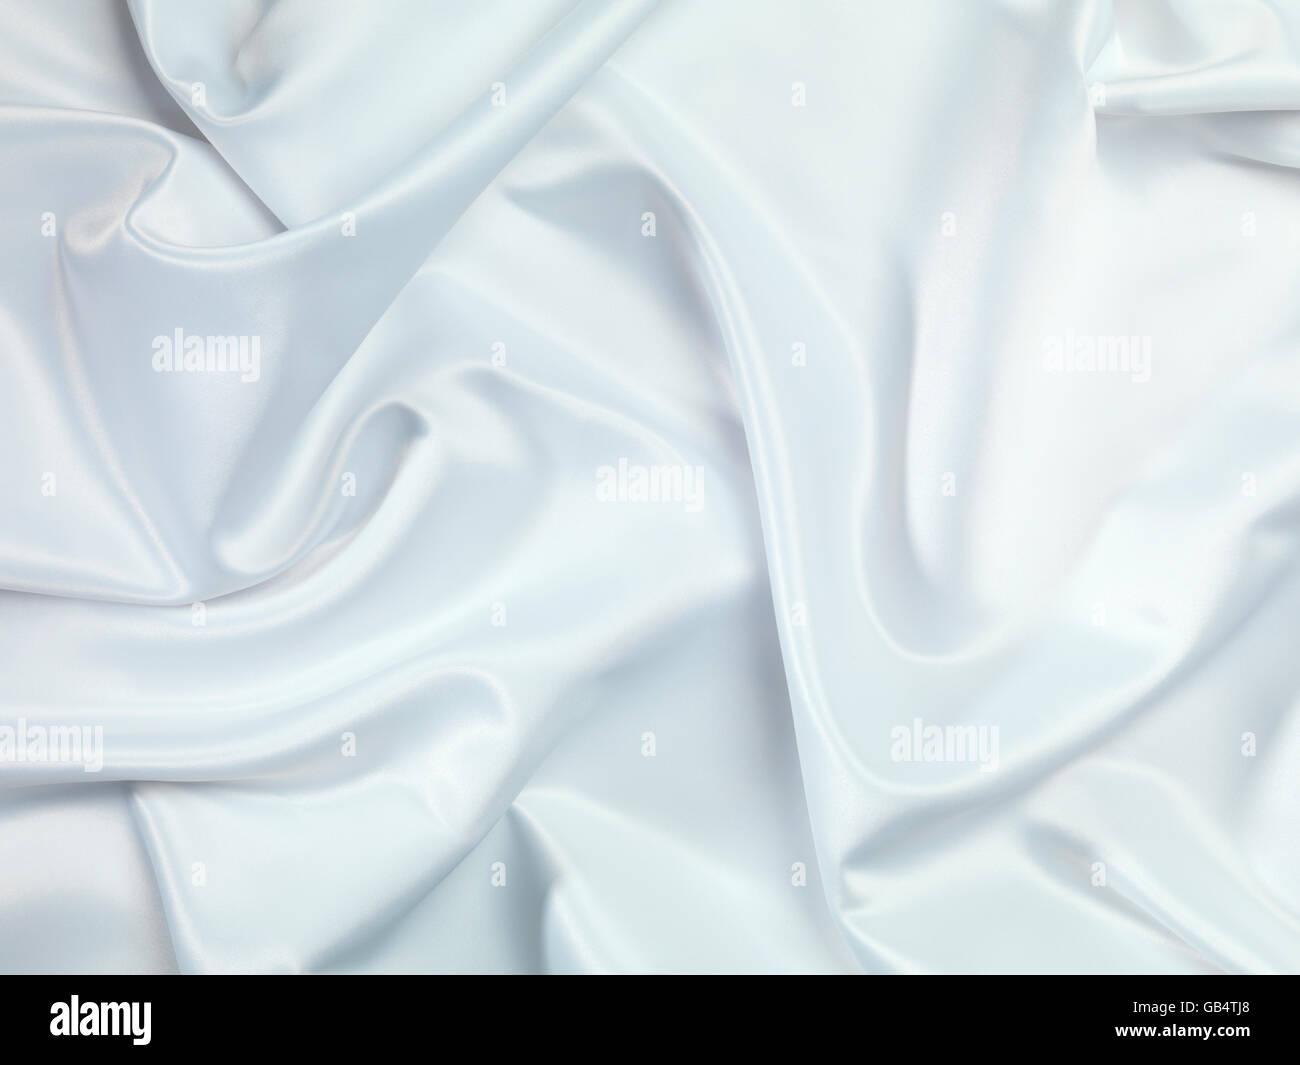 Shiny white silky fabric folds, texture, background - Stock Image